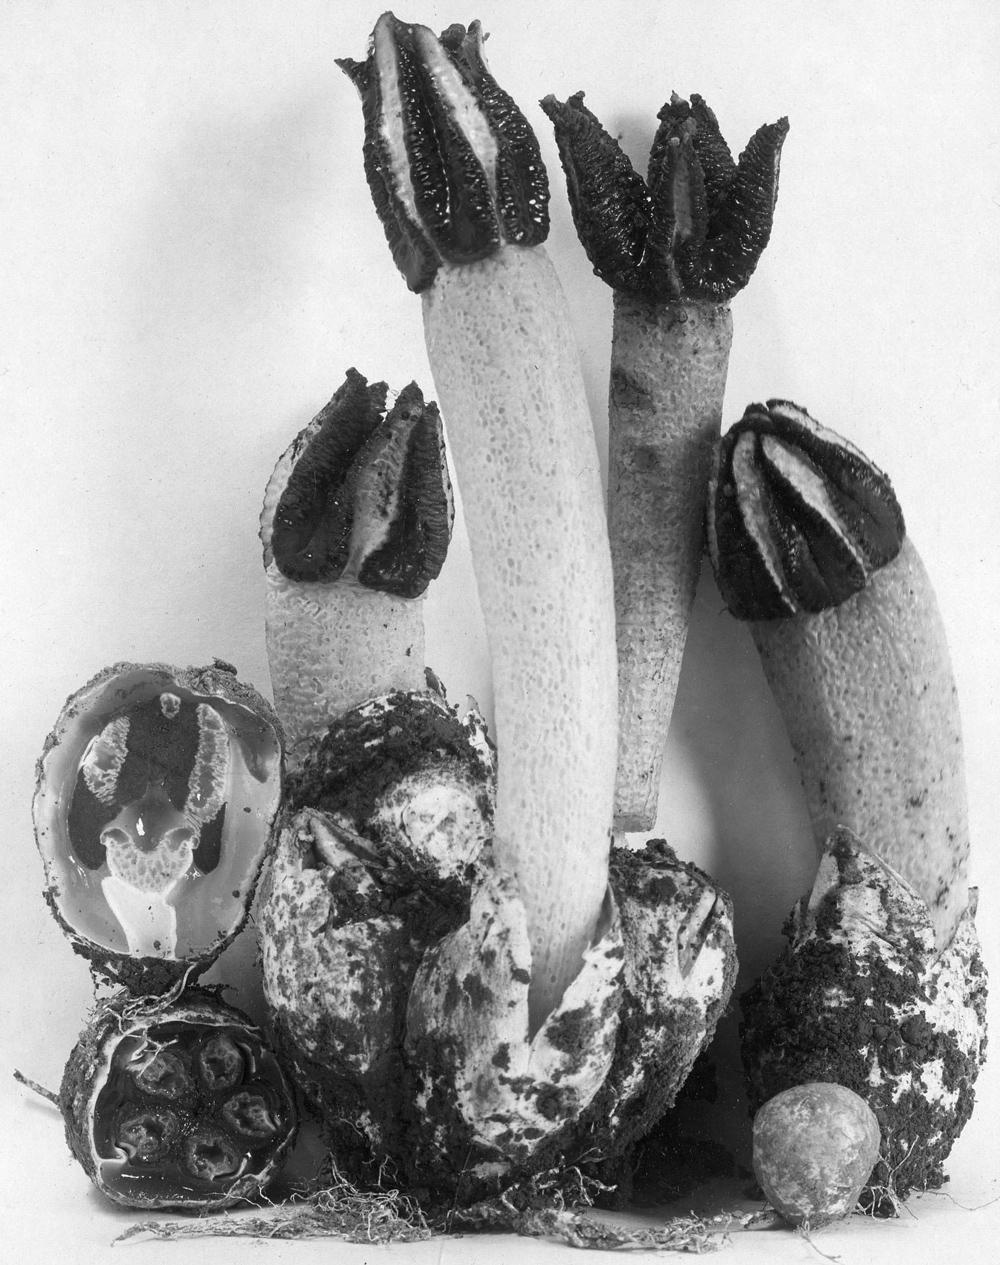 Anthurus borealis, a stinkhorn, CUP-A-22704